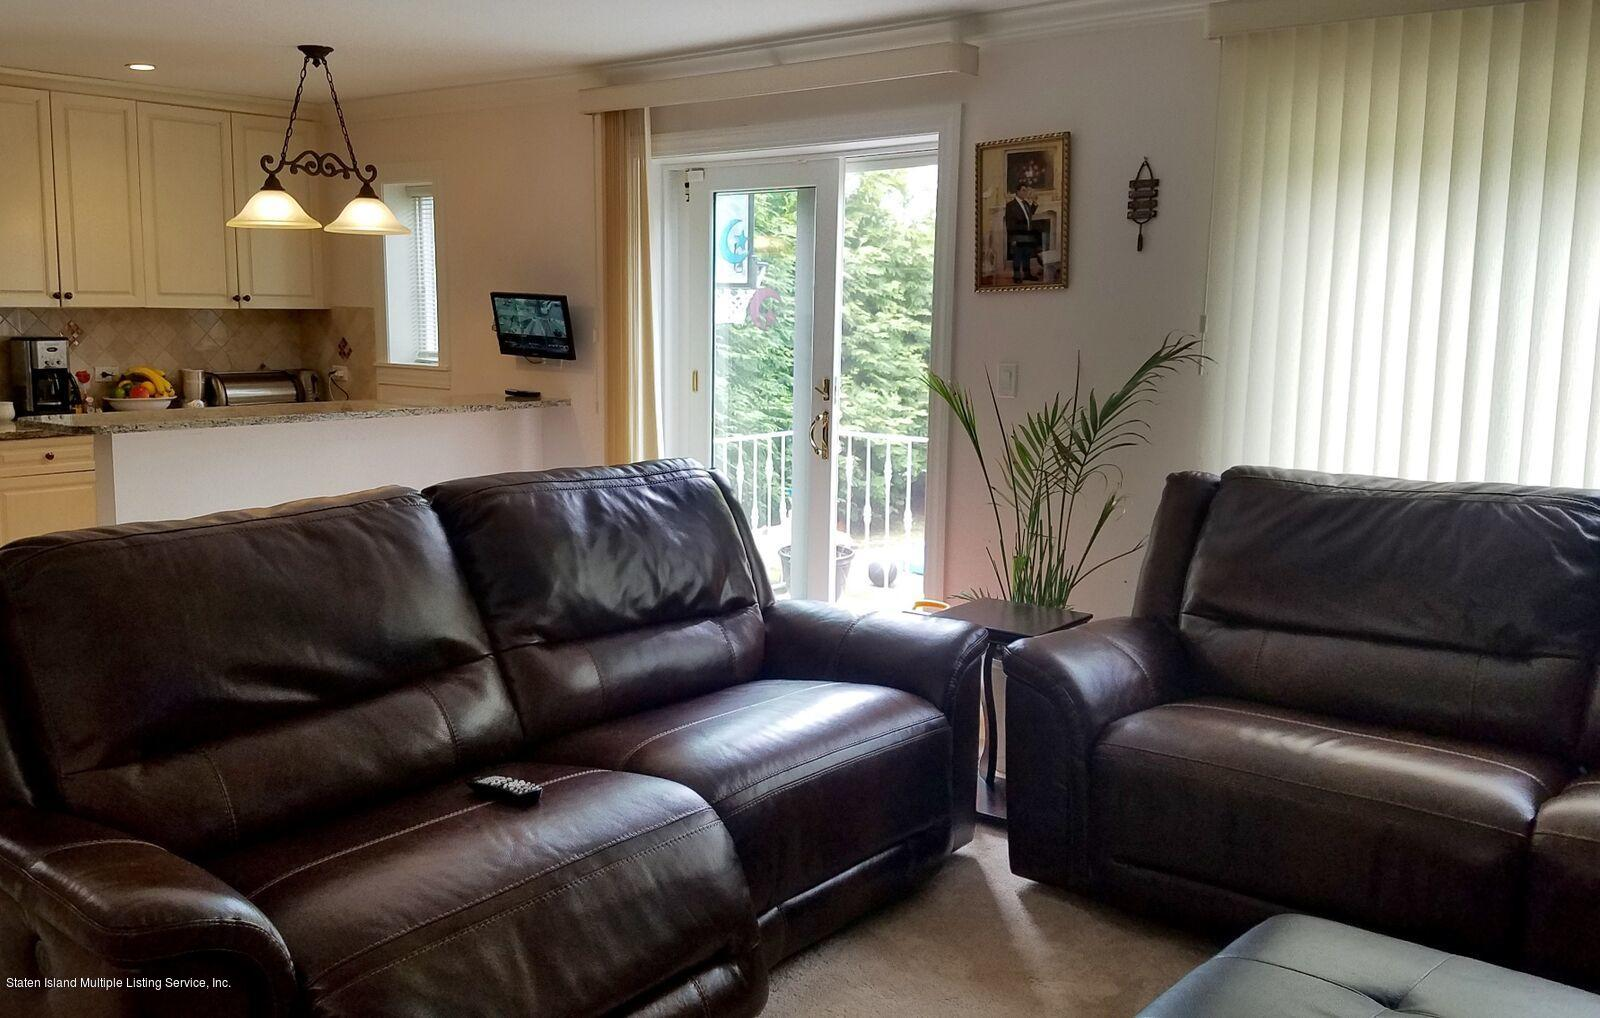 Single Family - Detached 104 Dutchess Ave   Staten Island, NY 10304, MLS-1113043-18